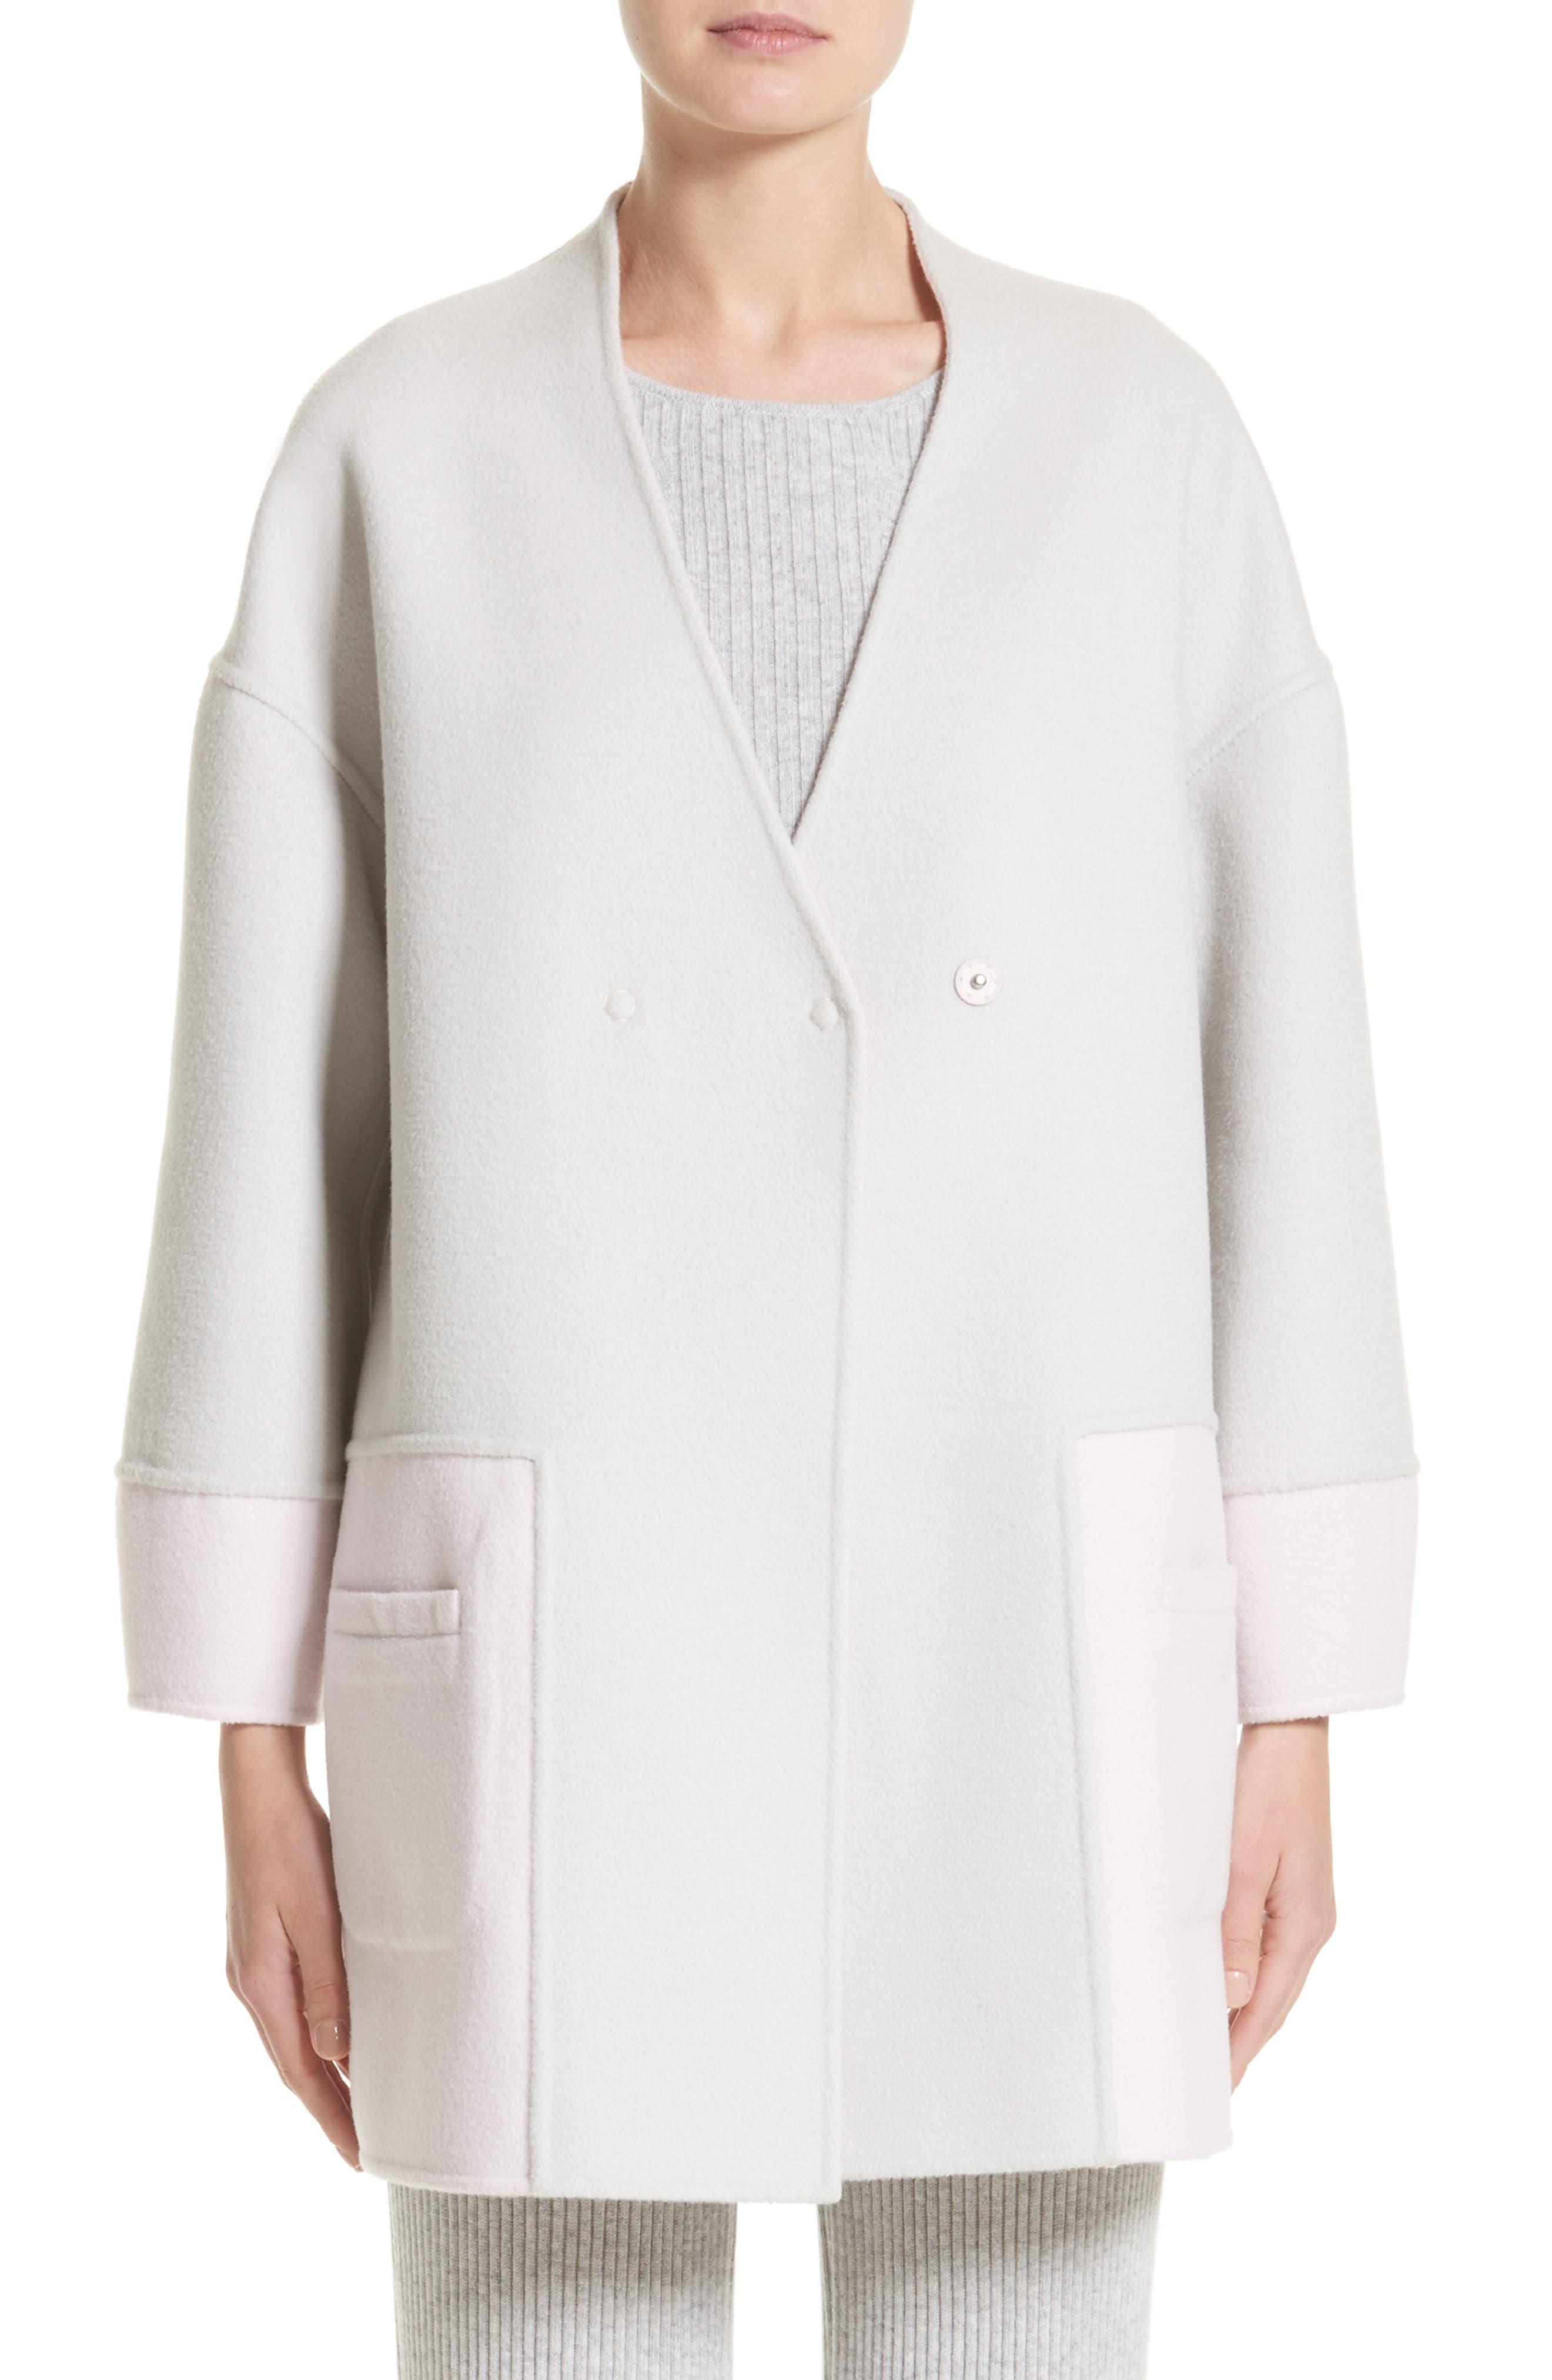 Reversible Wool Blend Cocoon Coat,                         Main,                         color, Petal/ Light Grey Melange